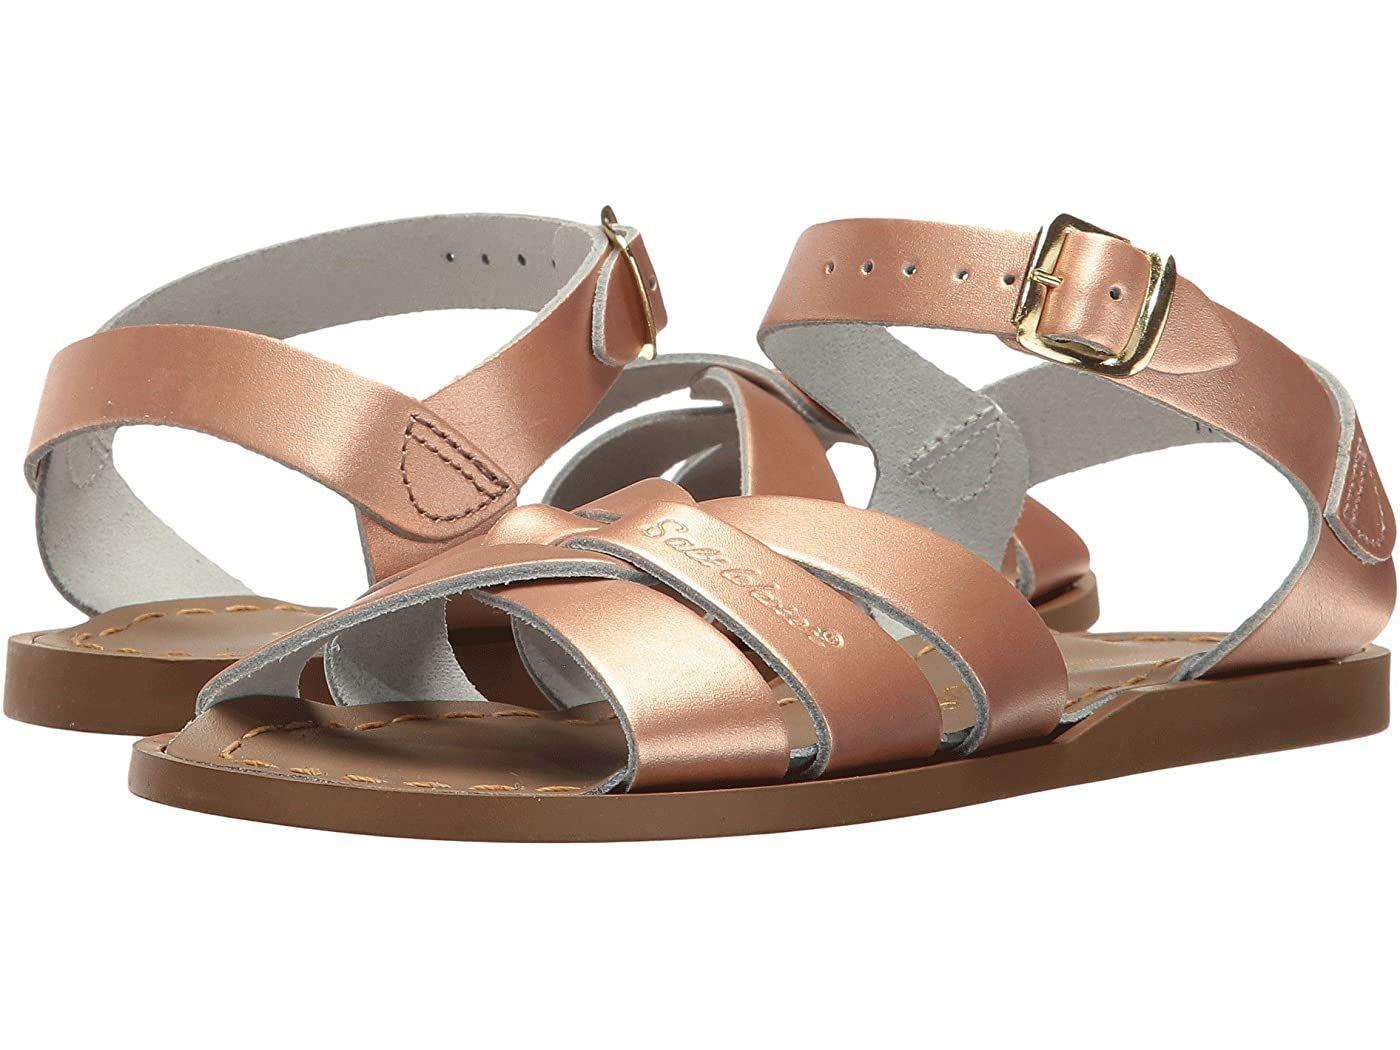 Hoy Shoes Salt Water Sandal